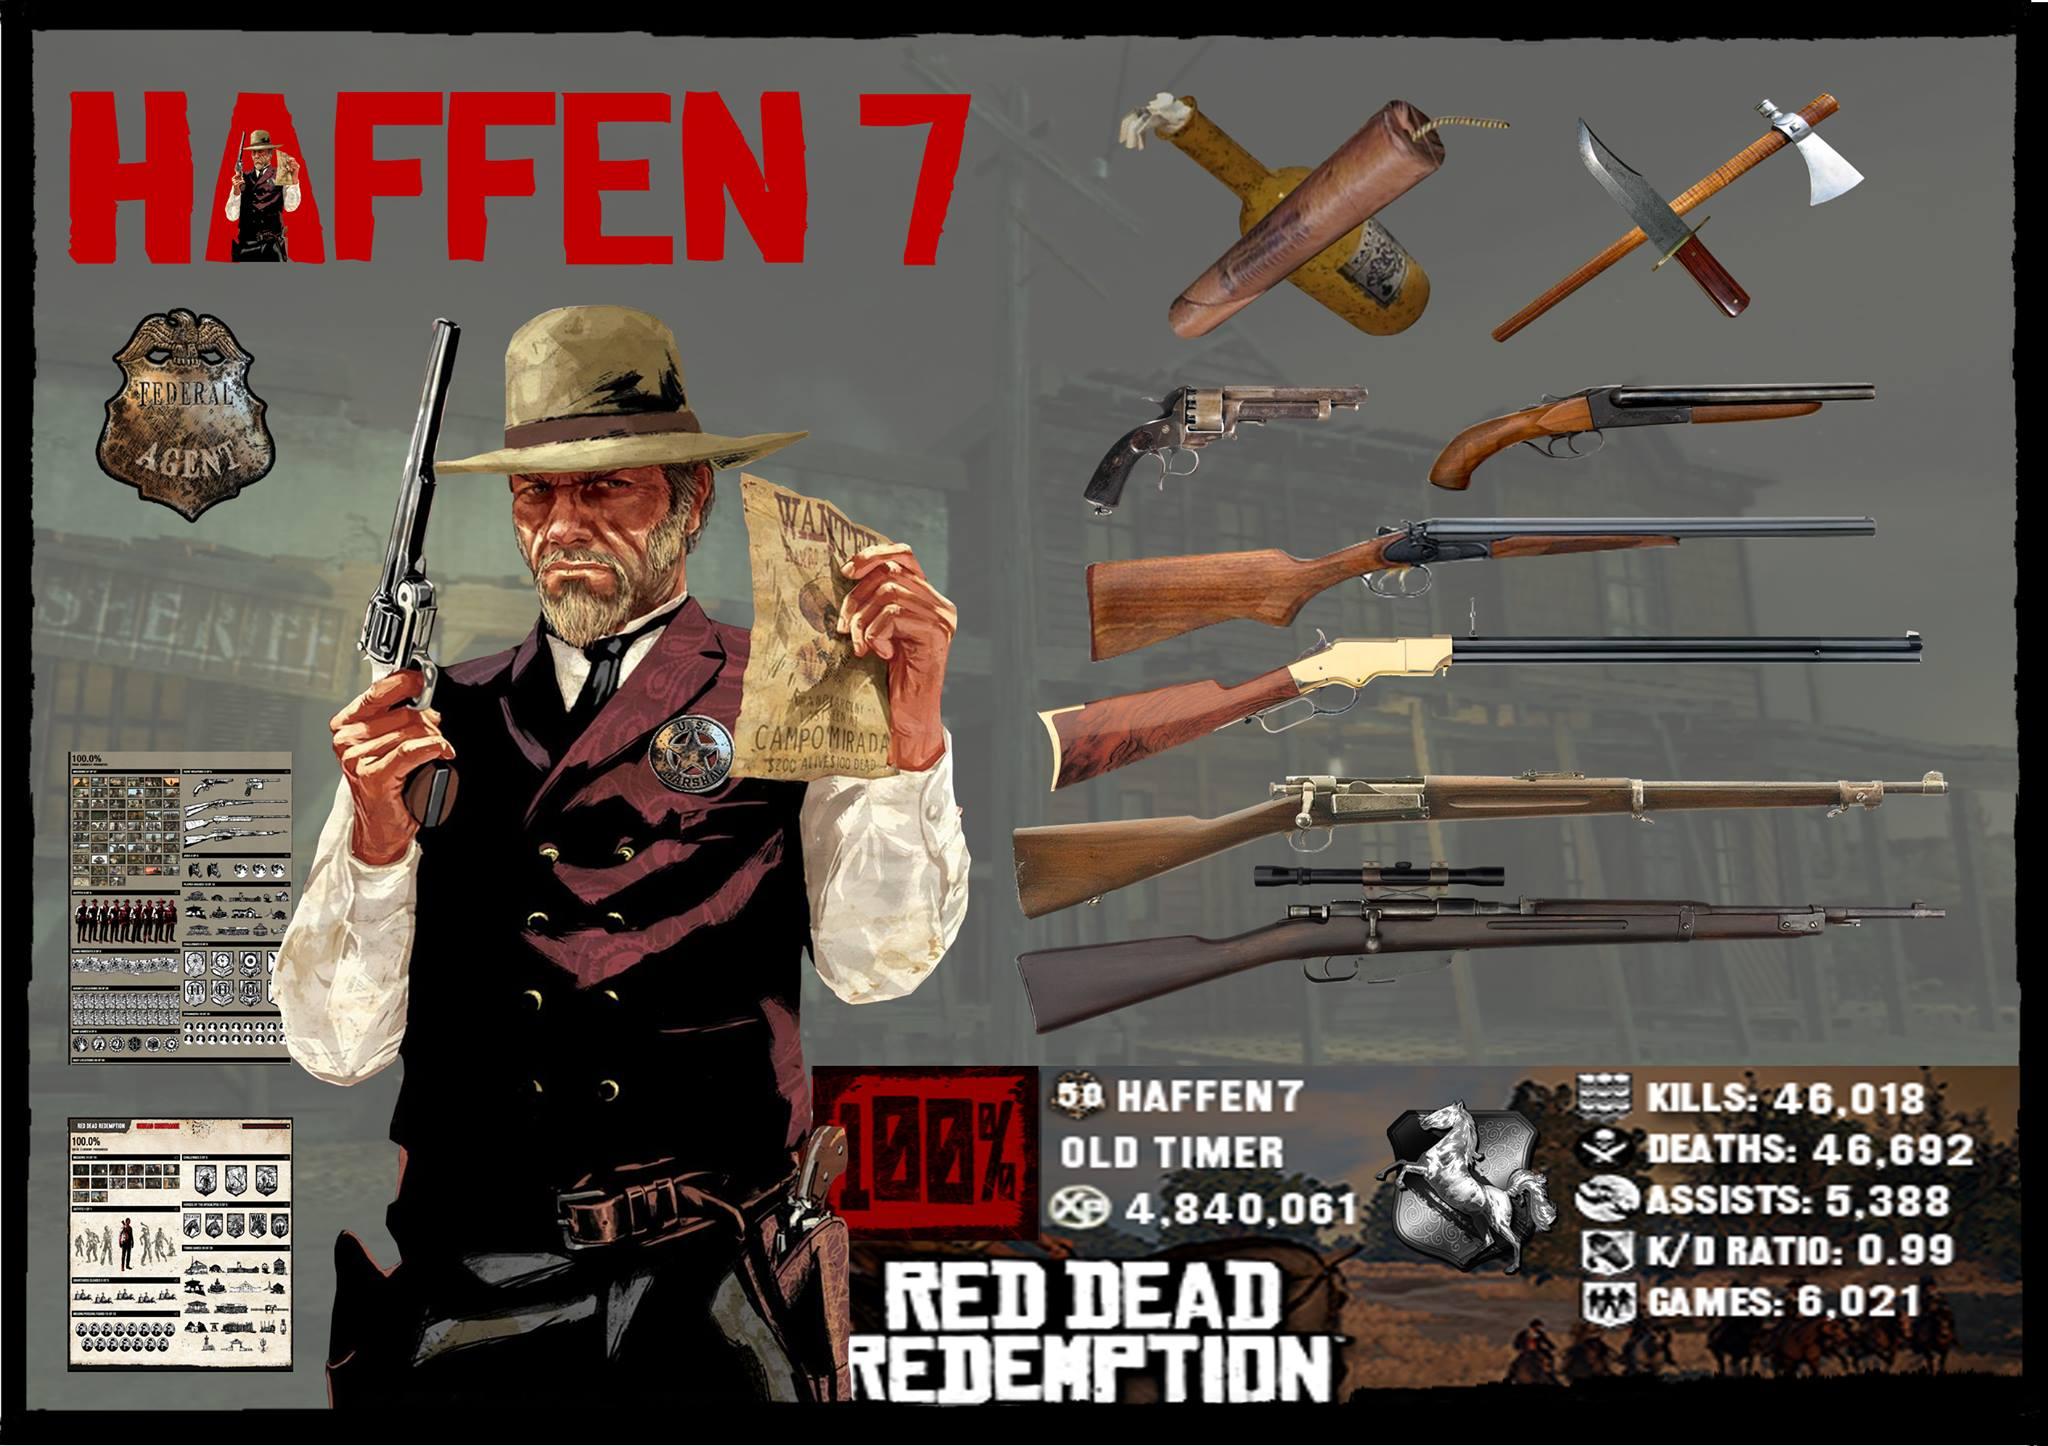 Haffen 7 new